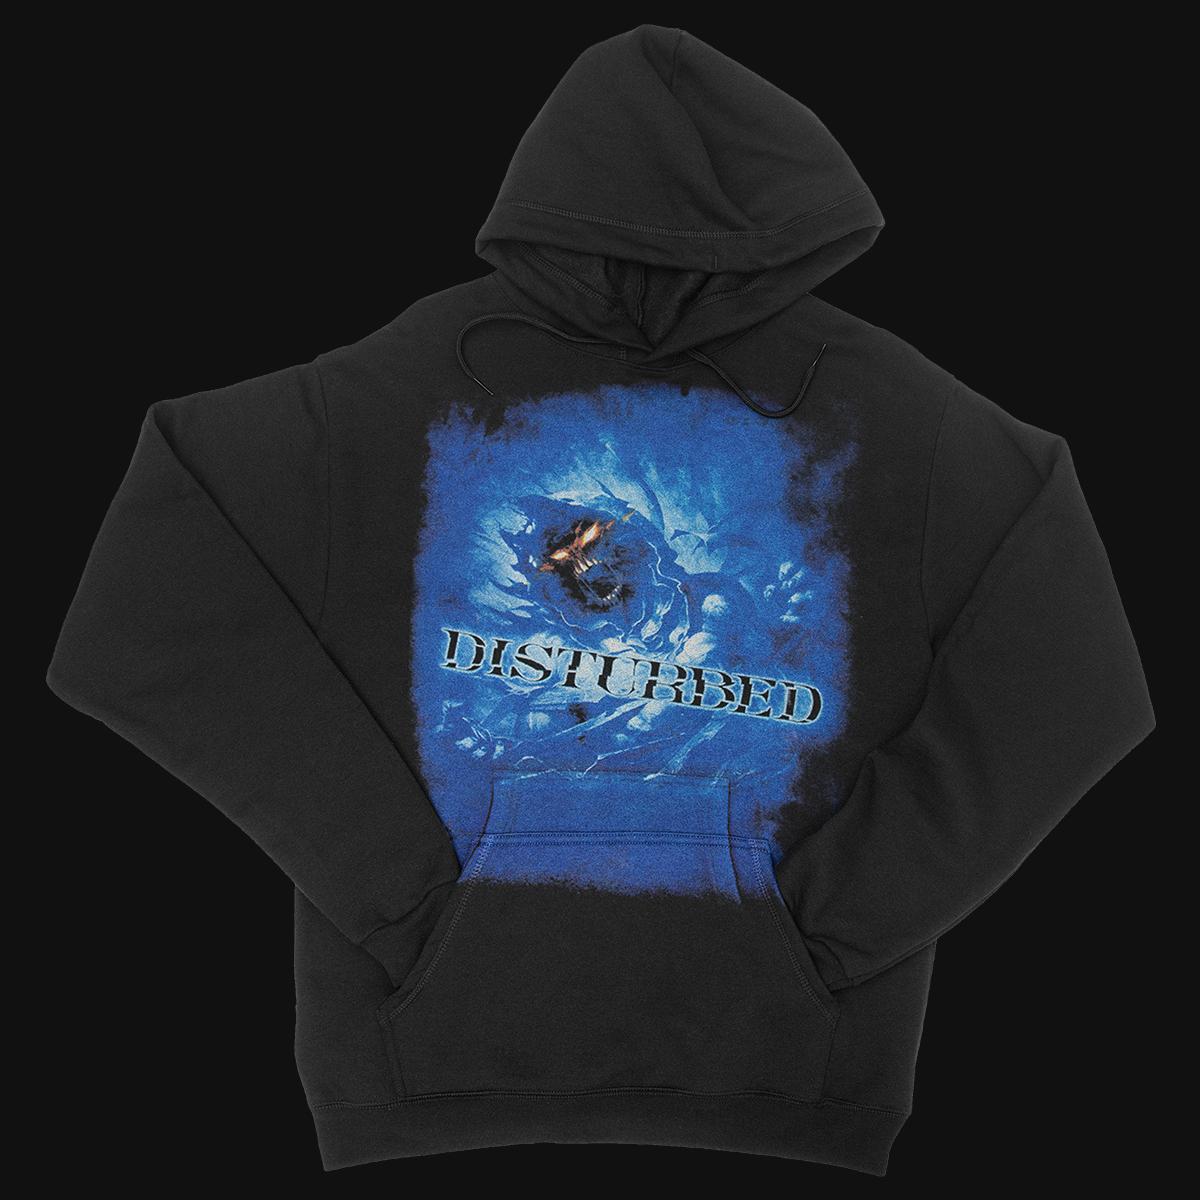 Disturbed Blue Face Hoodie